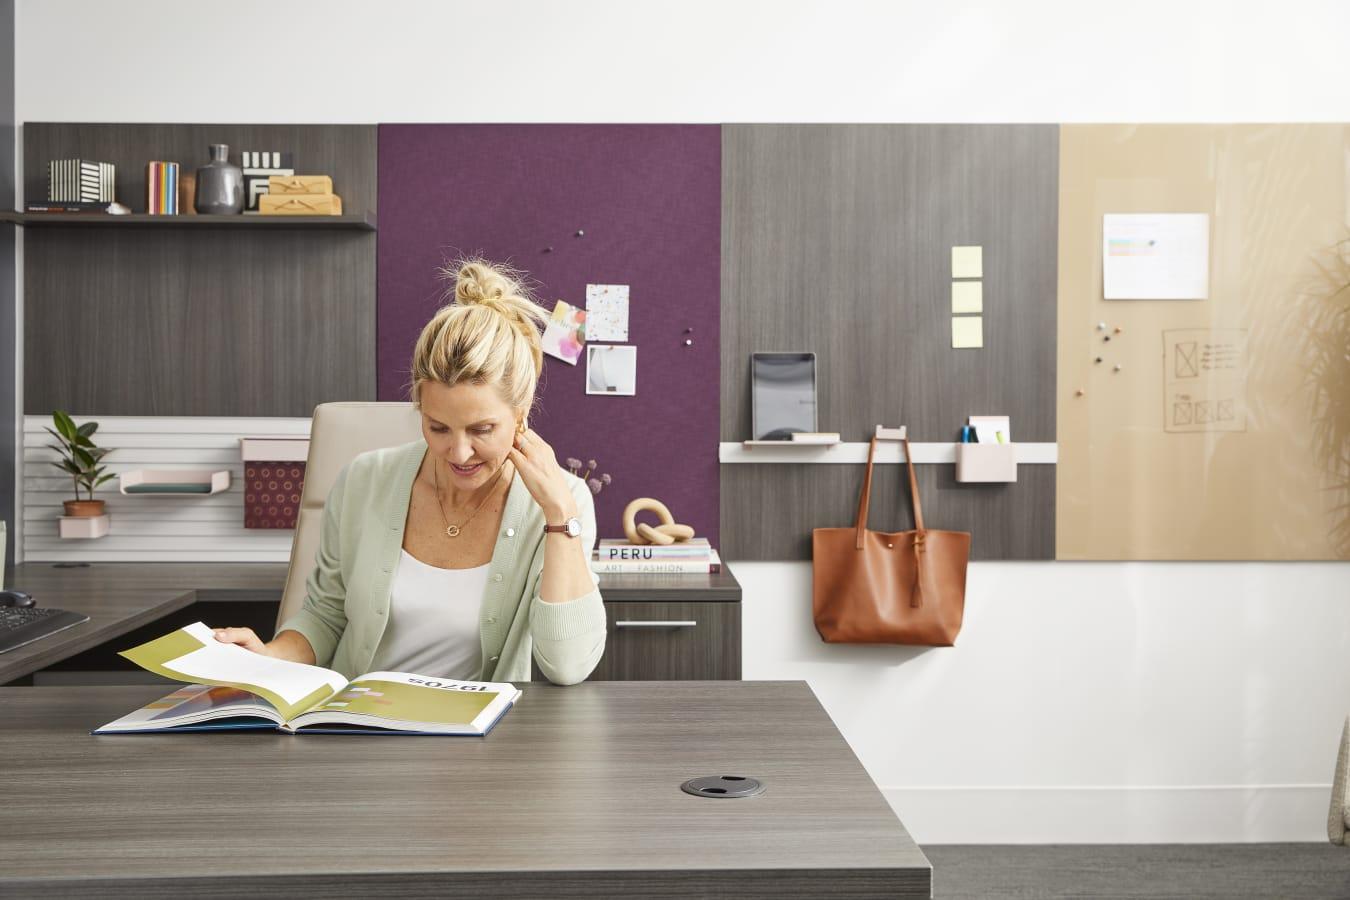 HON/Marketing%20Resources/hon.com/Research-Insights/Sep-20-Blog-Image-3